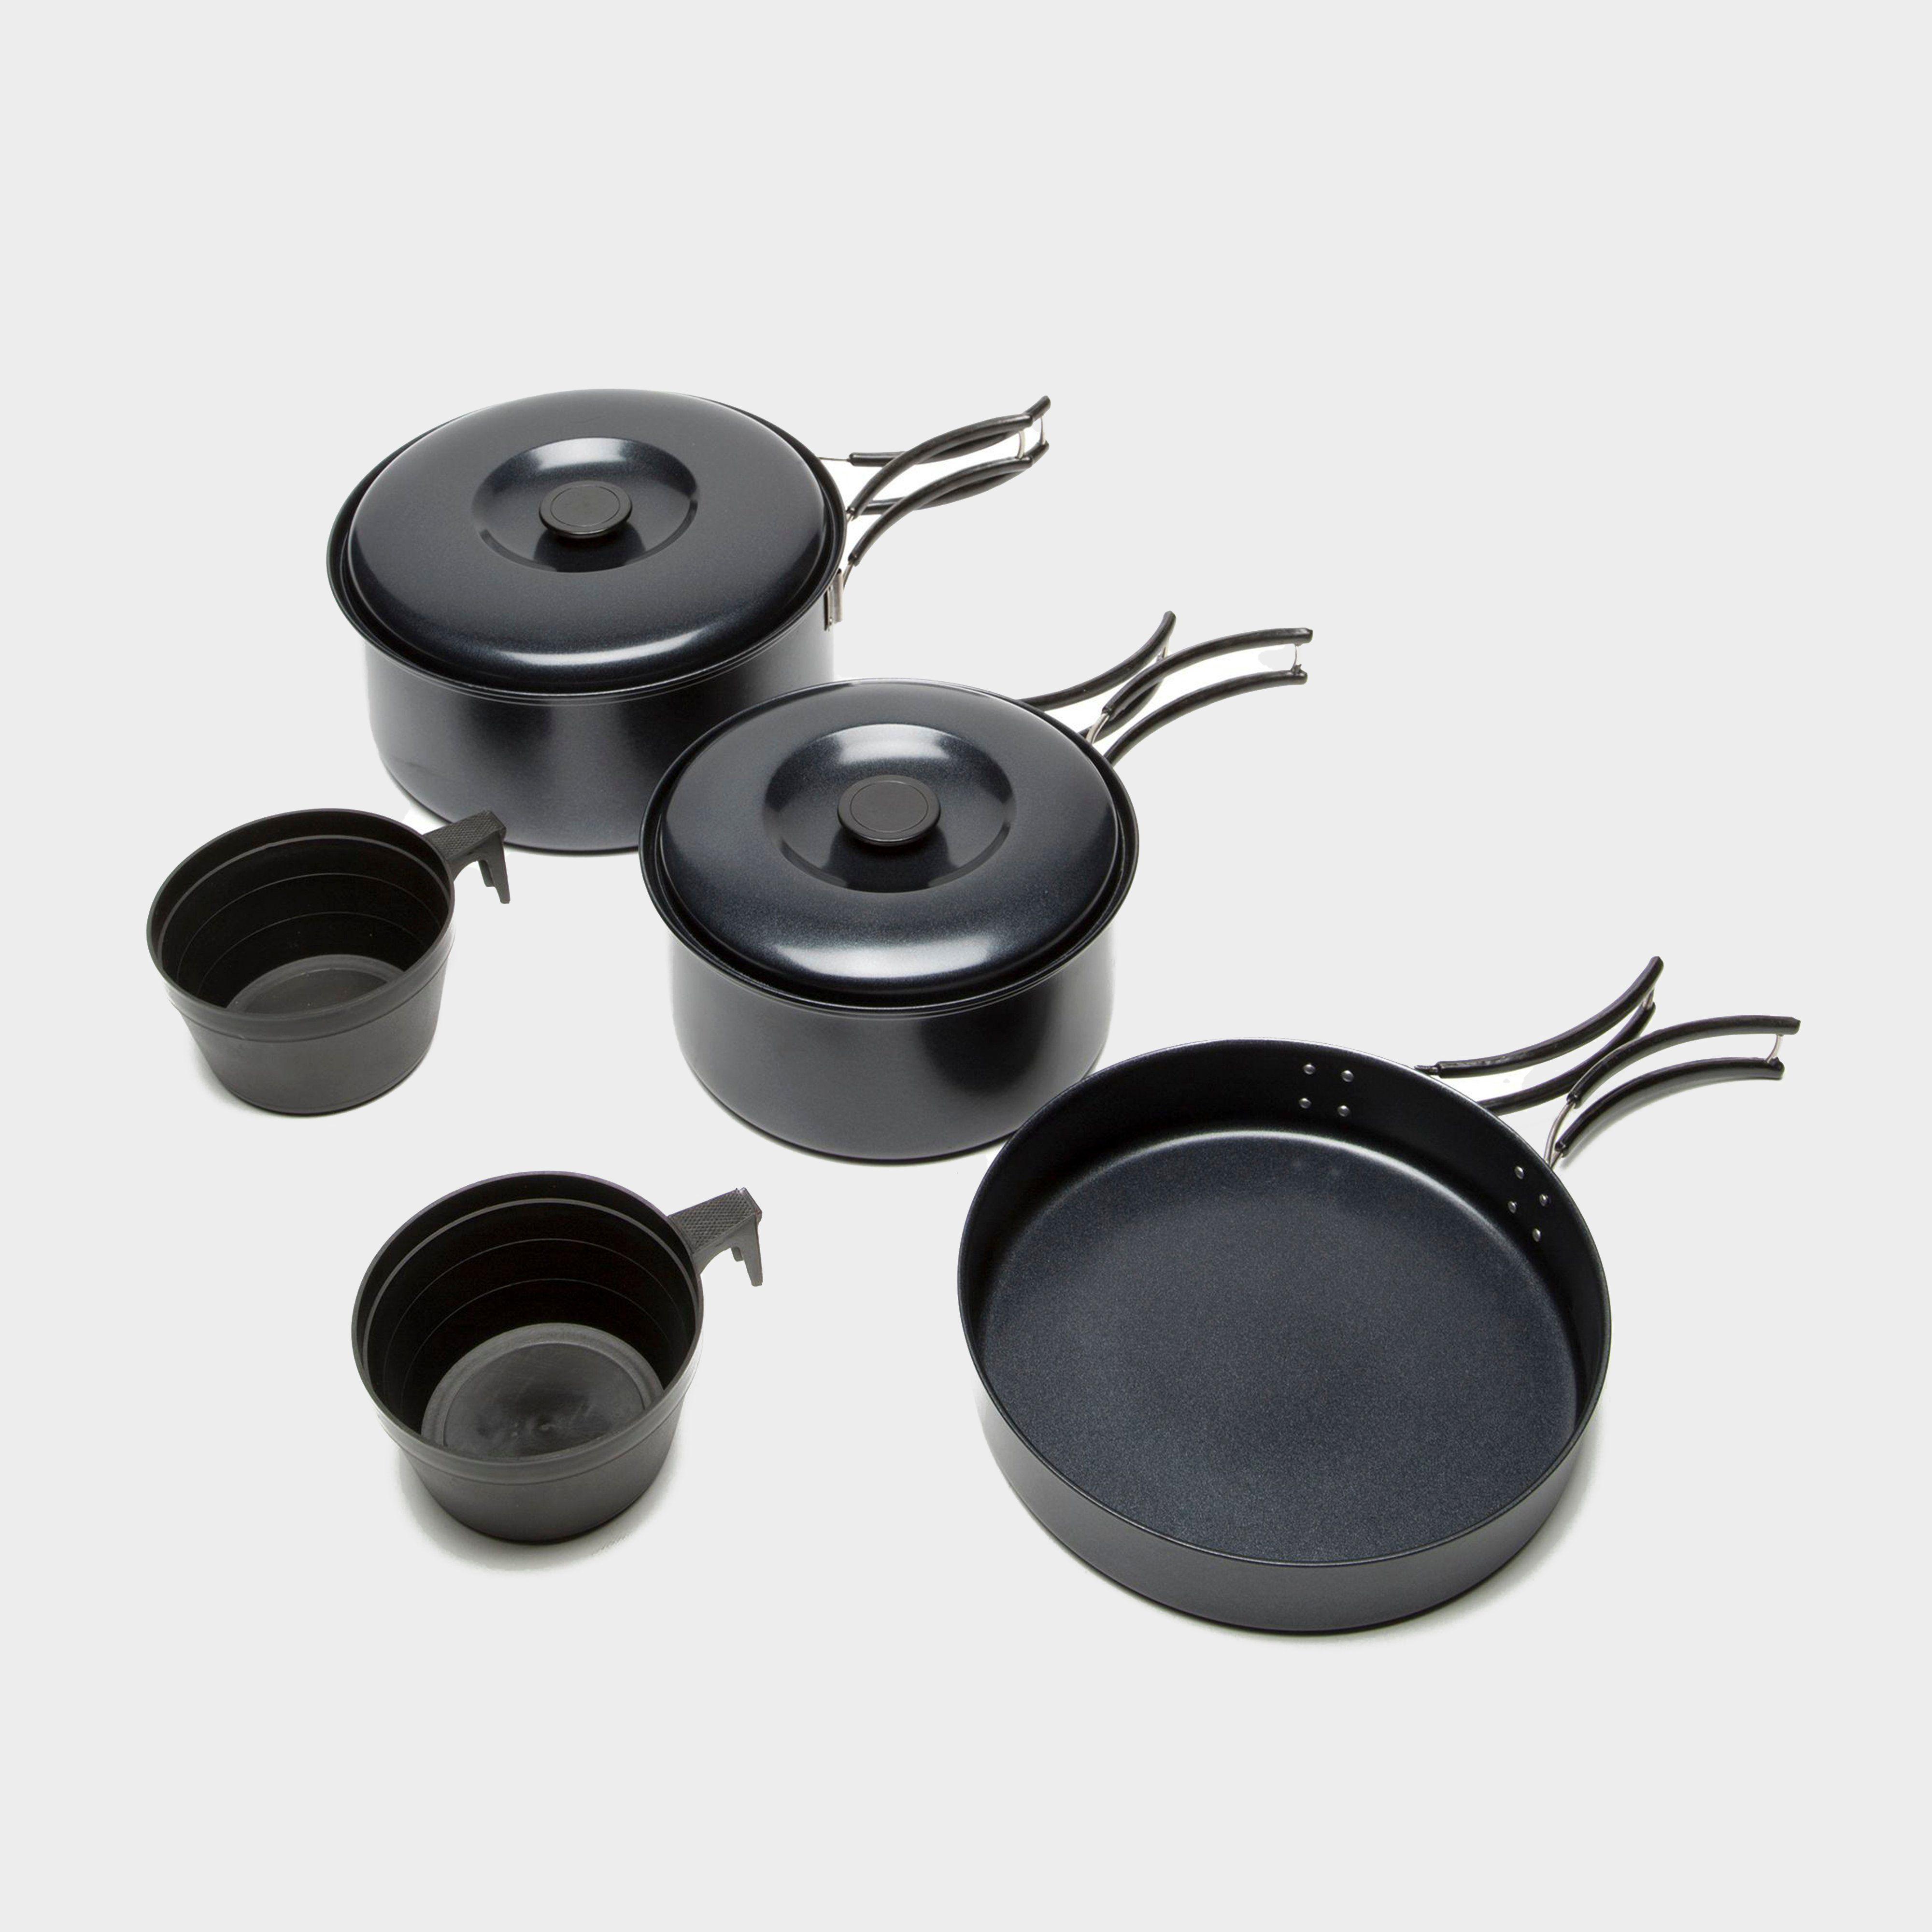 VANGO Non-Stick Cook Kit 2 Person